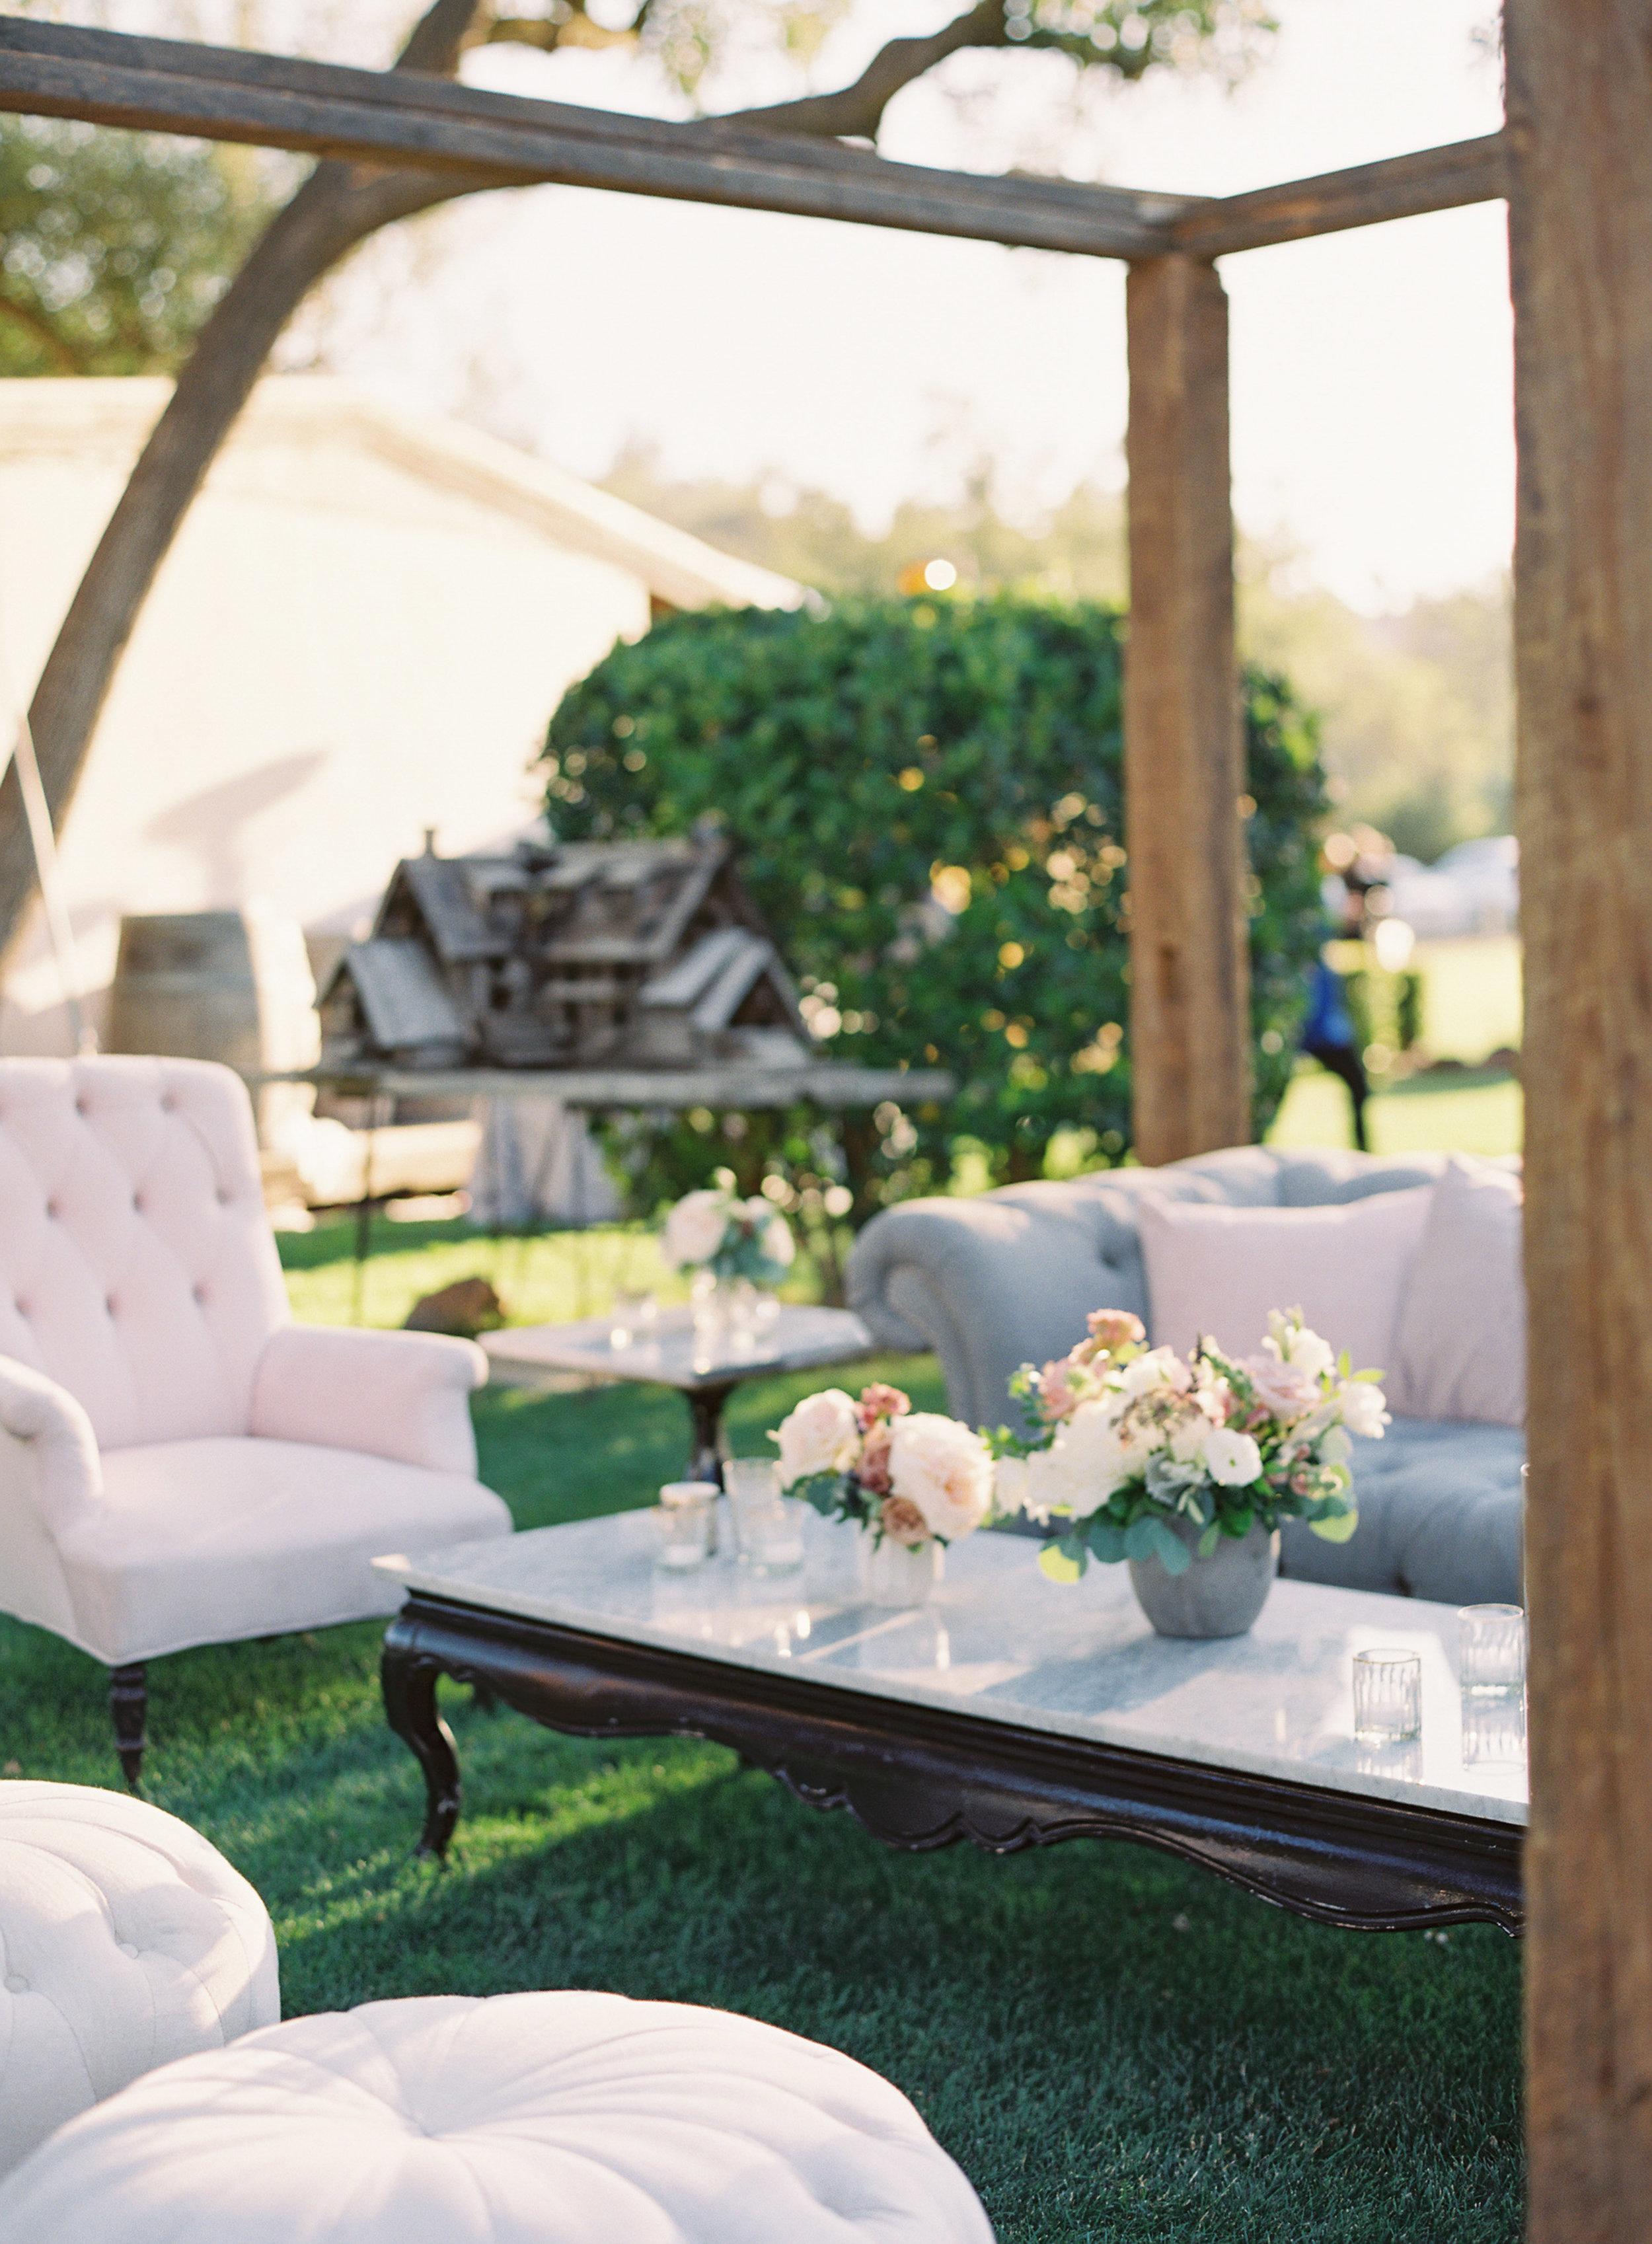 Triunfo_Creek_Winery_Wedding-174-Jen-Huang-JL-462-Jen-Huang-009973-R1-010.jpg